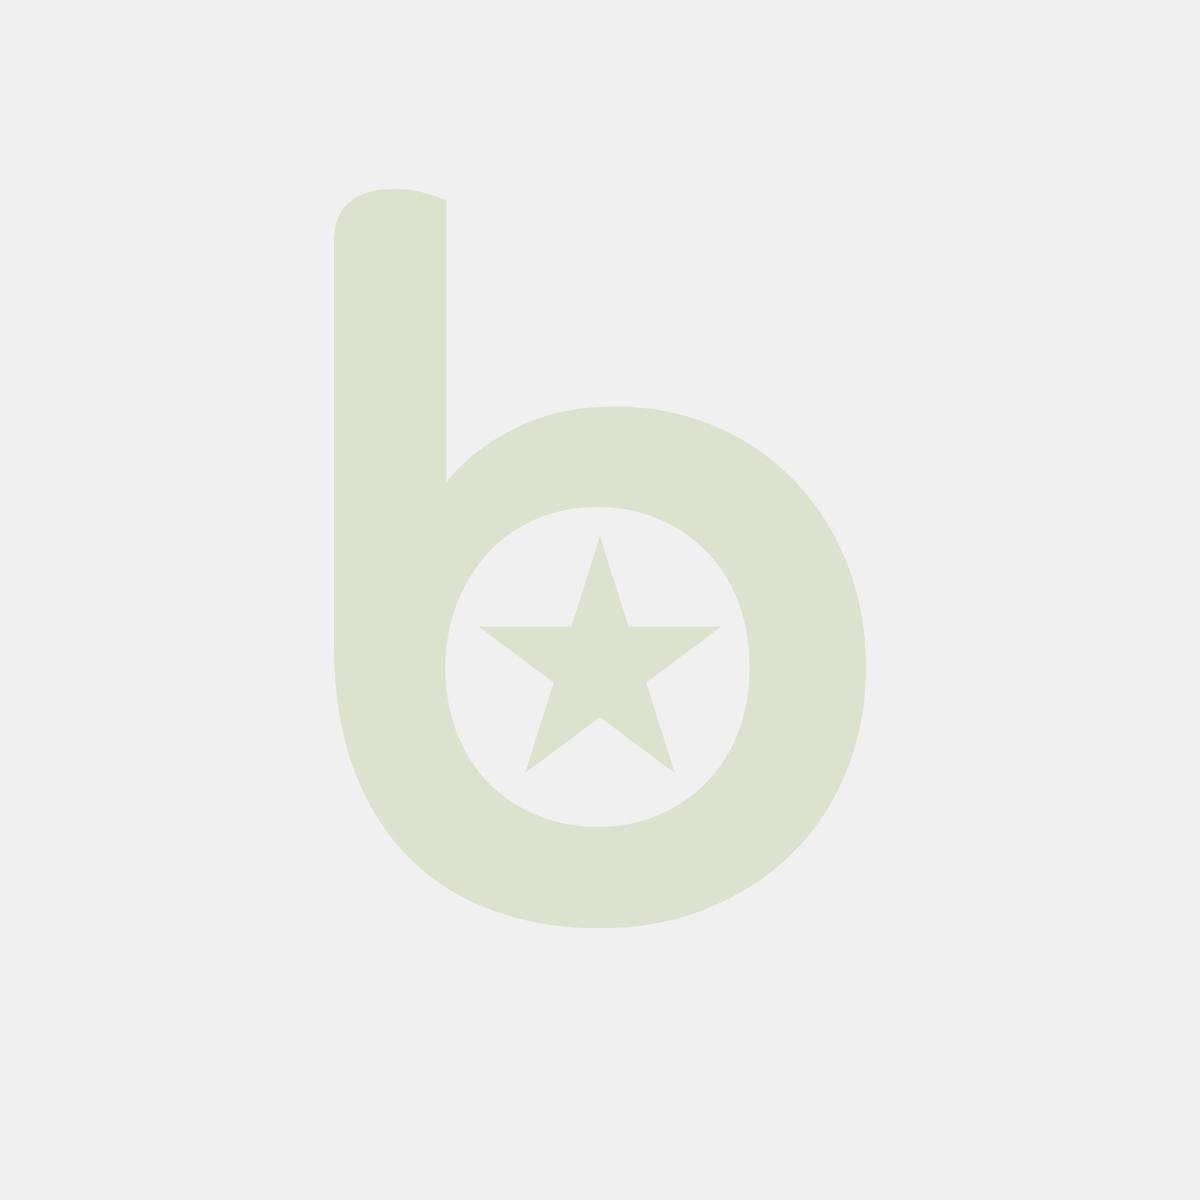 Rondel Profi Line Bez Pokrywki 1,2 L; Śr. 140 X 70 H